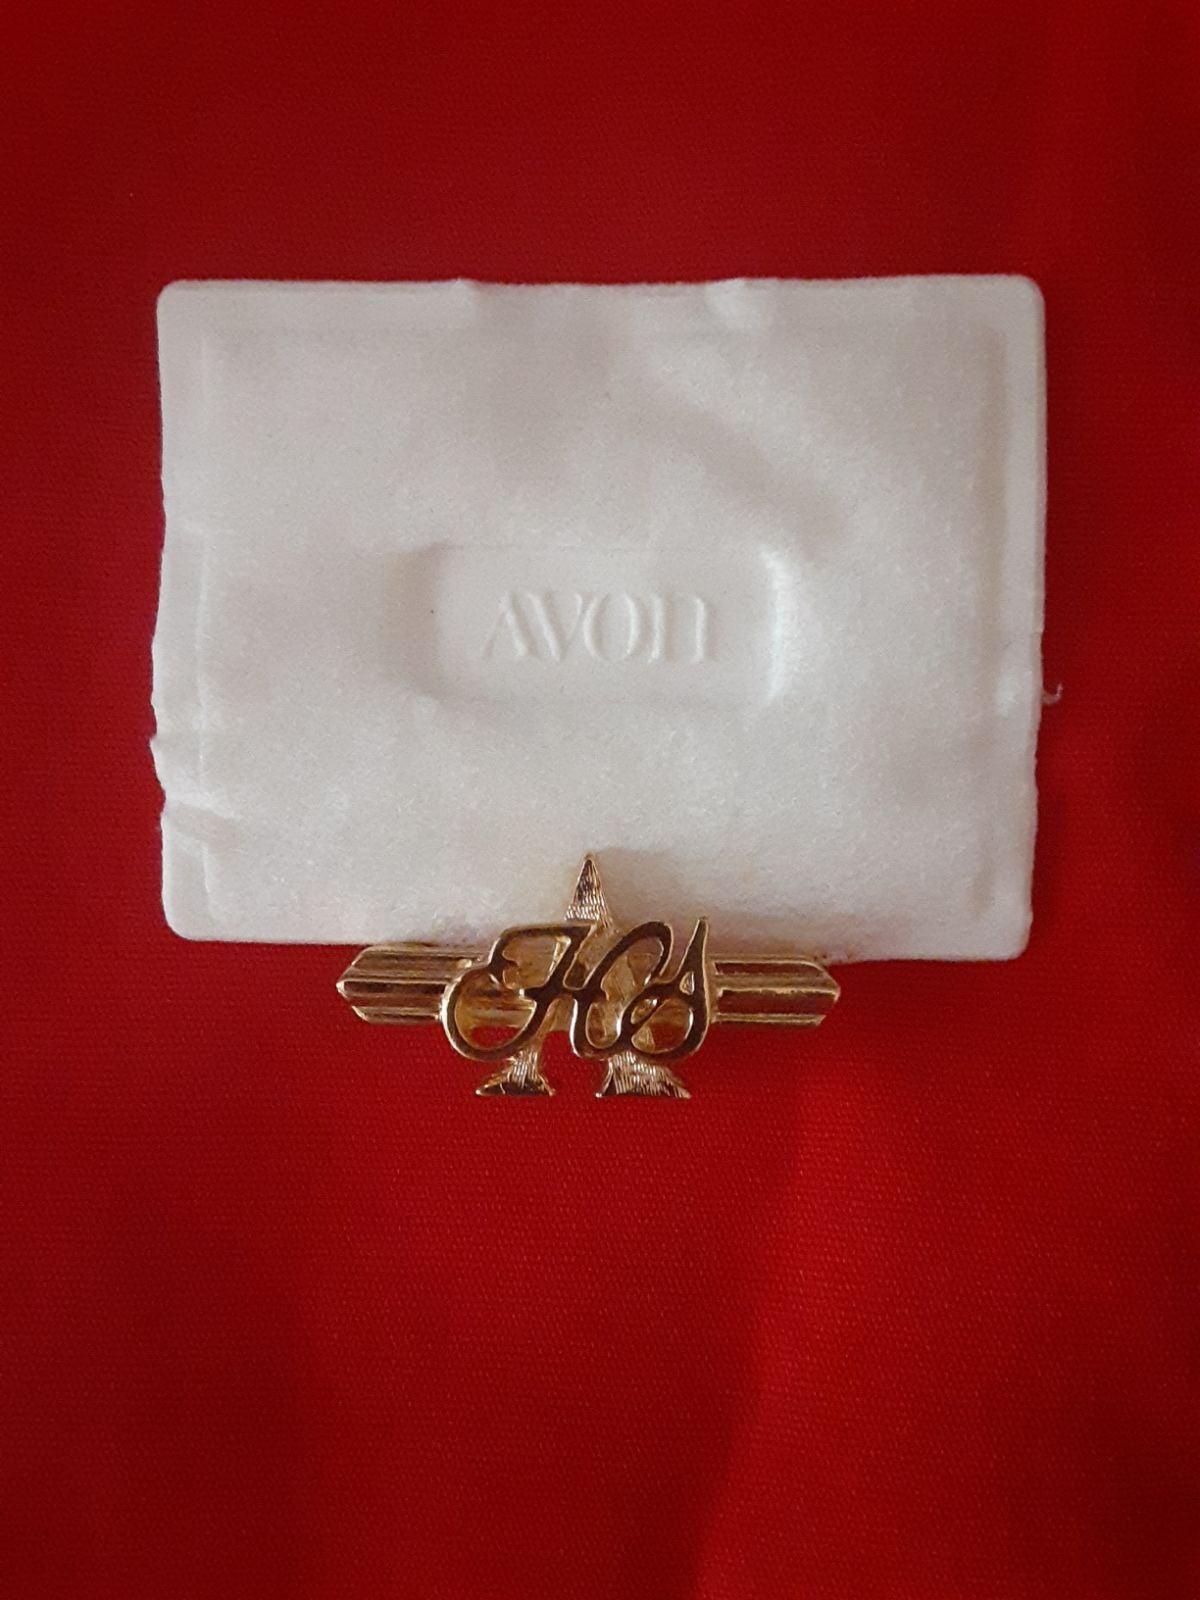 Avon Honor Society Male Pin